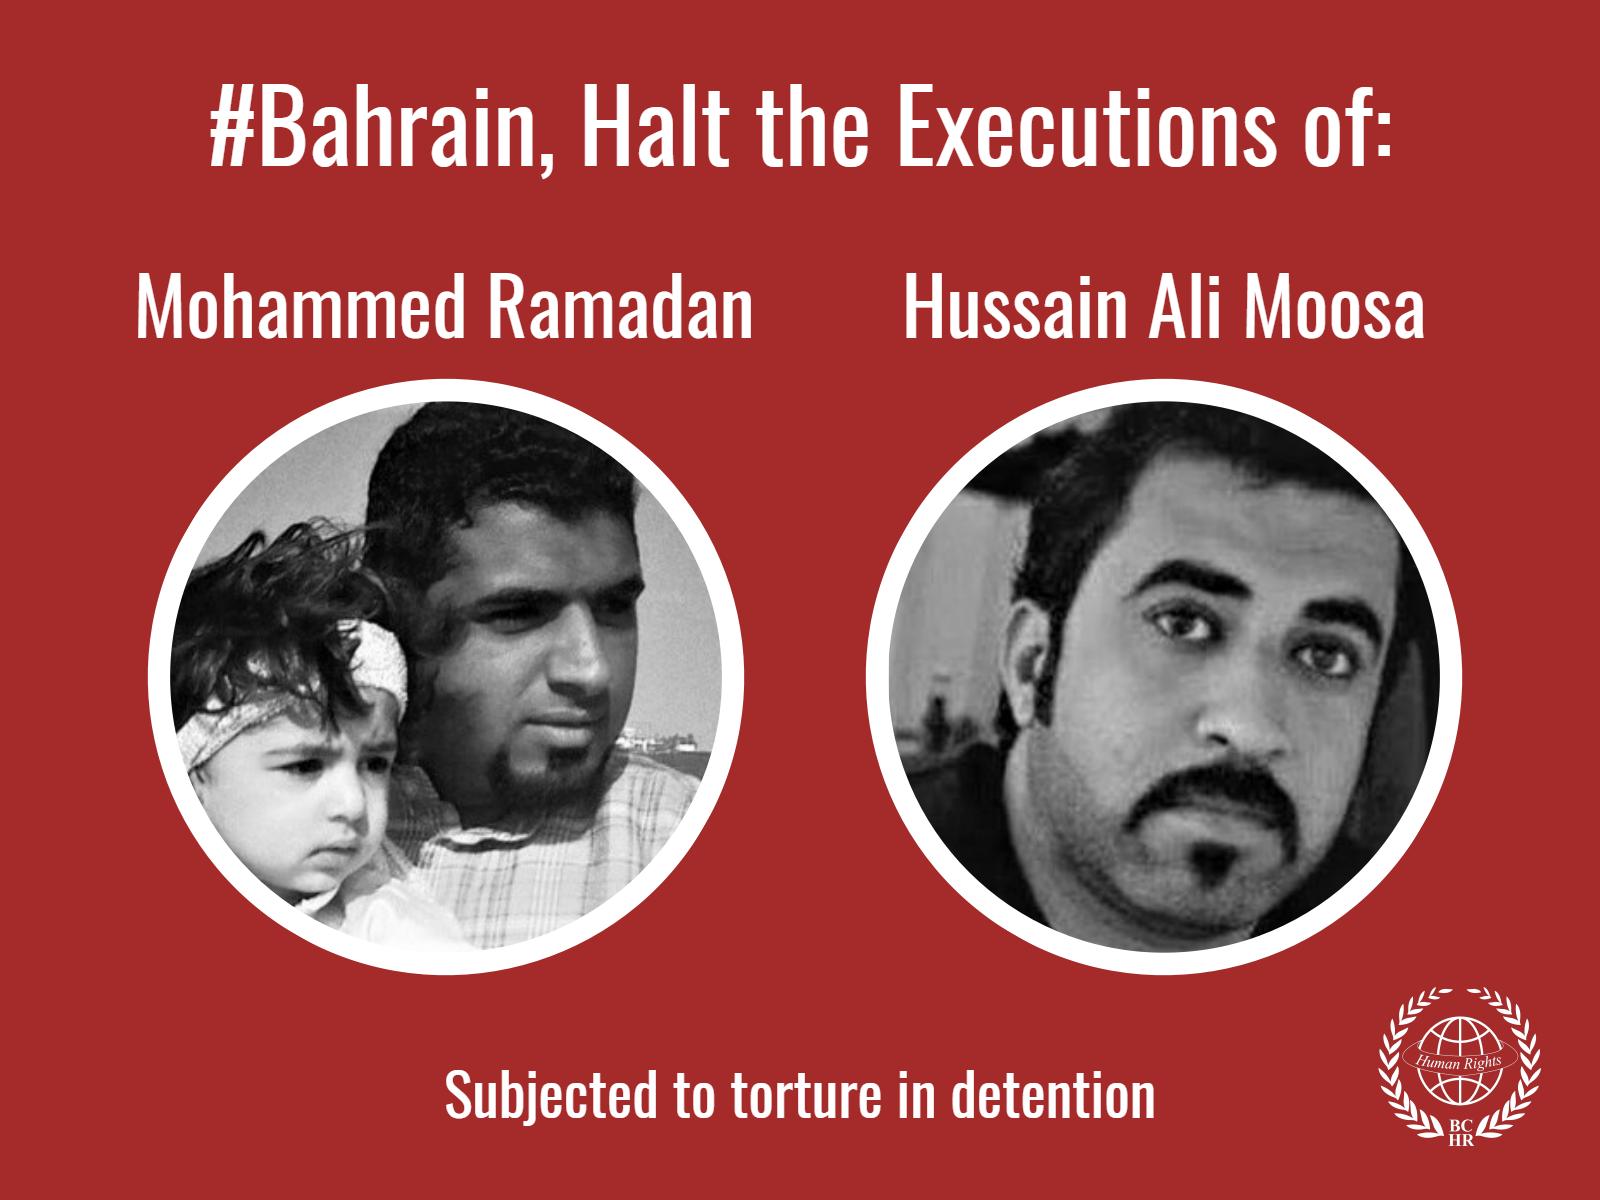 Halt the Executions of Mohammed Ramadan and Hussain Ali Moosa